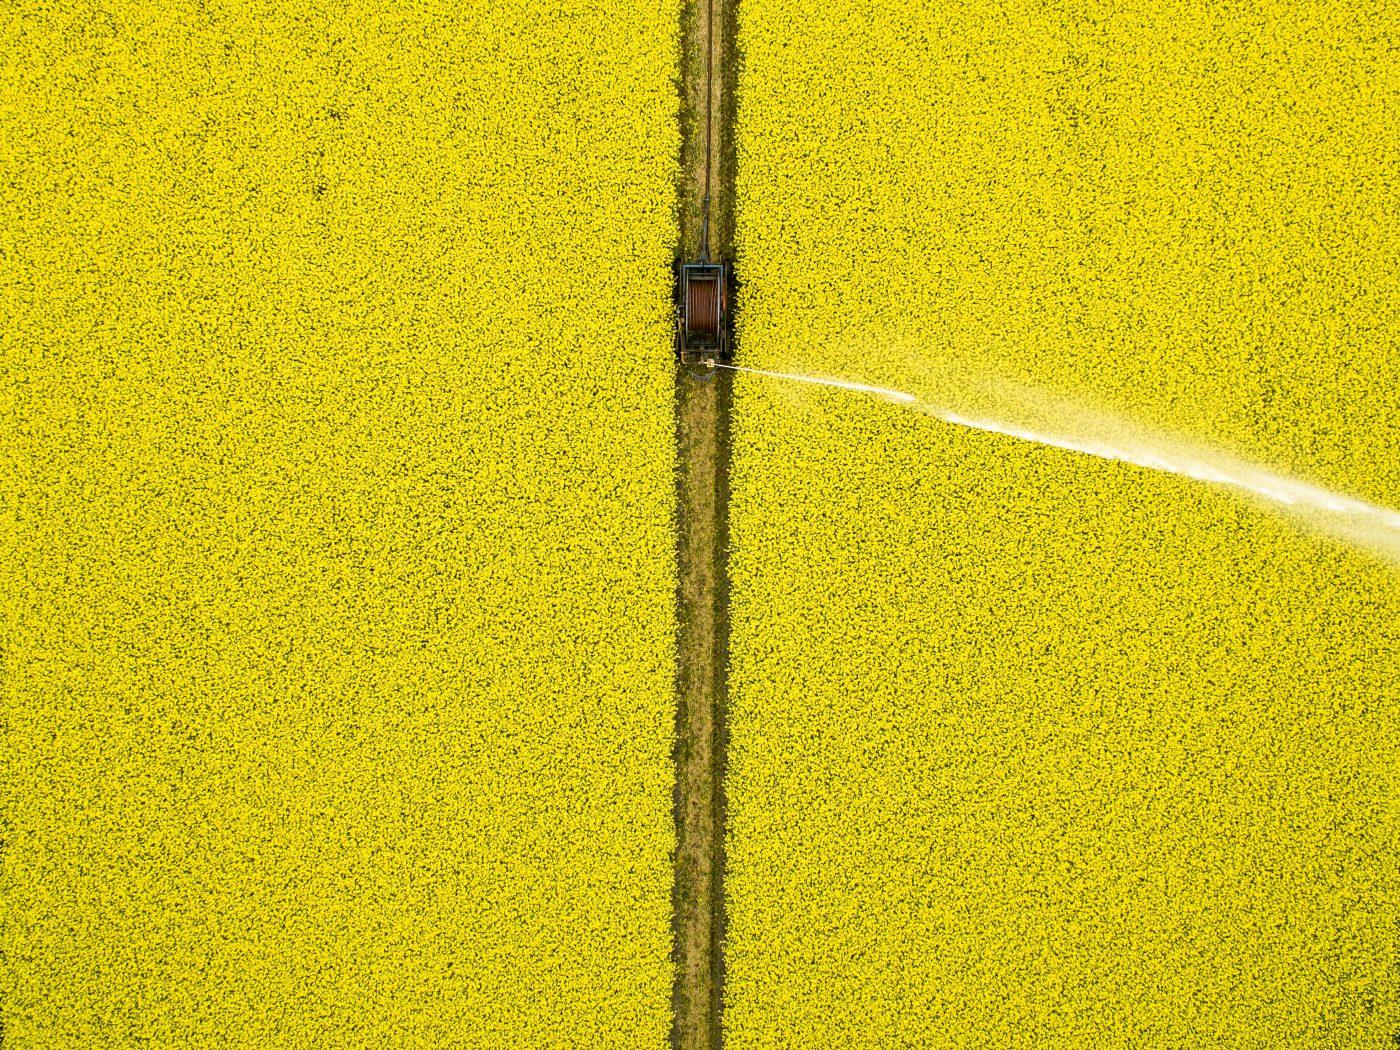 Poster-Drone-90-grader-Gul-rapsmark-30x40-cm.jpg